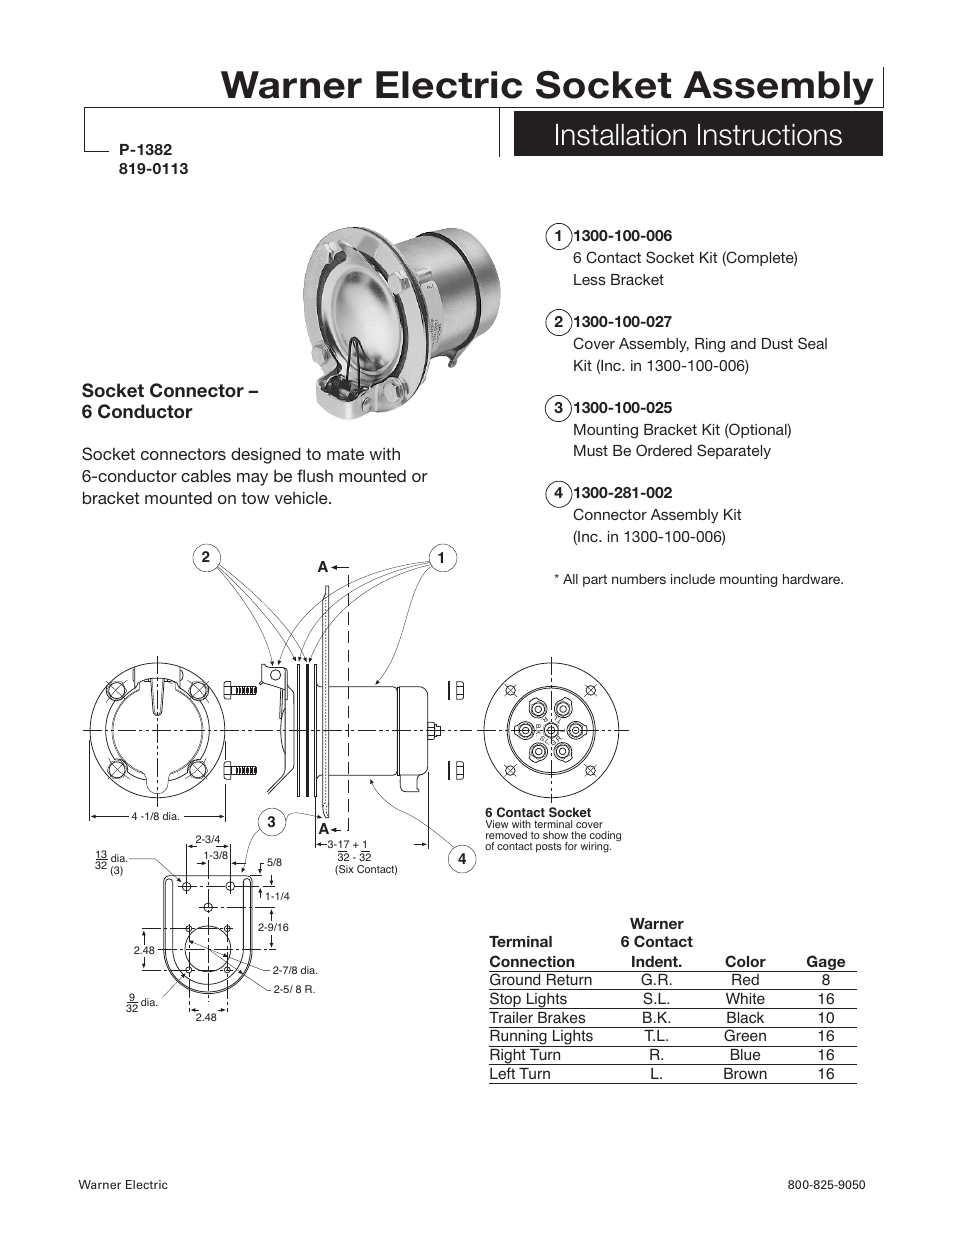 hight resolution of warner electric electric socket assembly installation user manualwarner electric electric socket assembly installation user manual 2